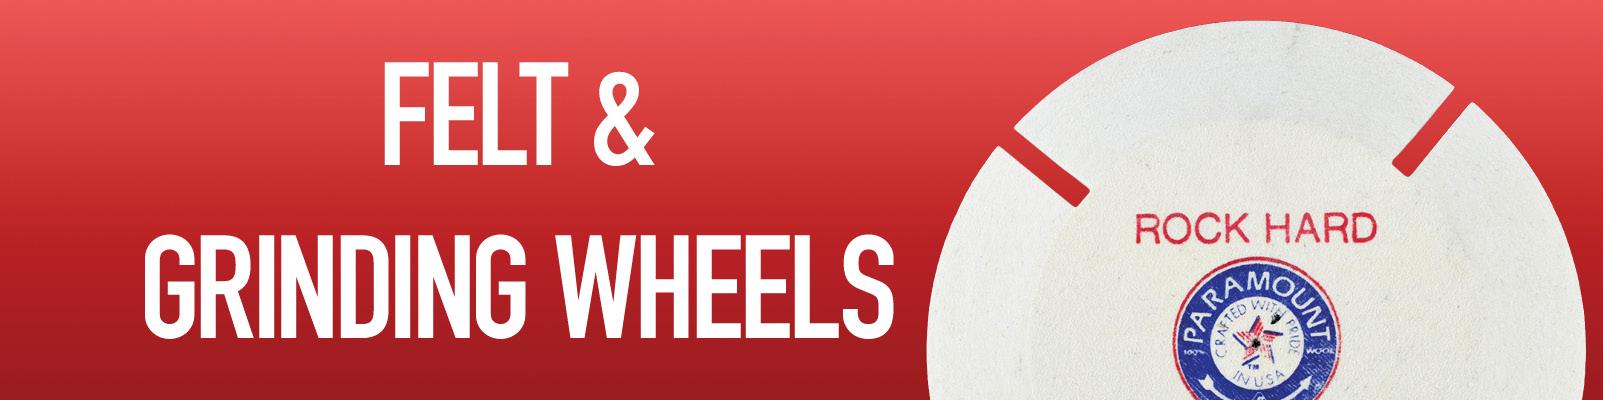 Felt / Grinding Wheels